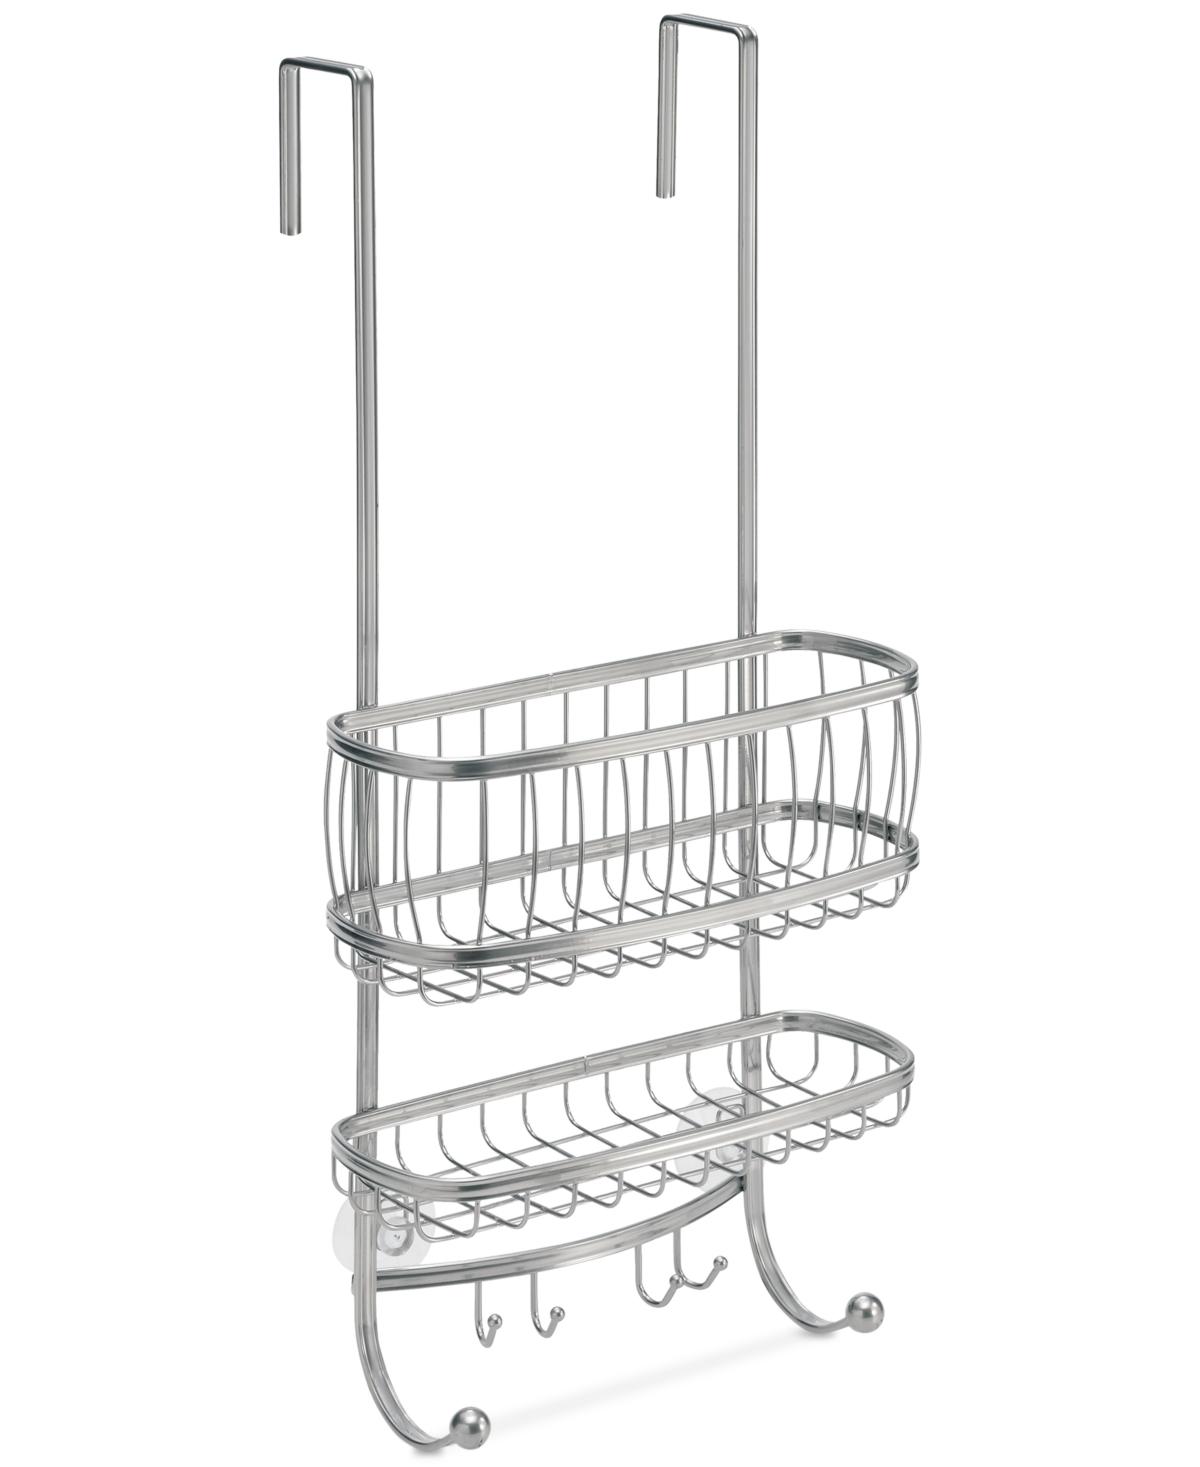 Interdesign York Silver 2-Tier Shower Caddy with Hooks Bedding